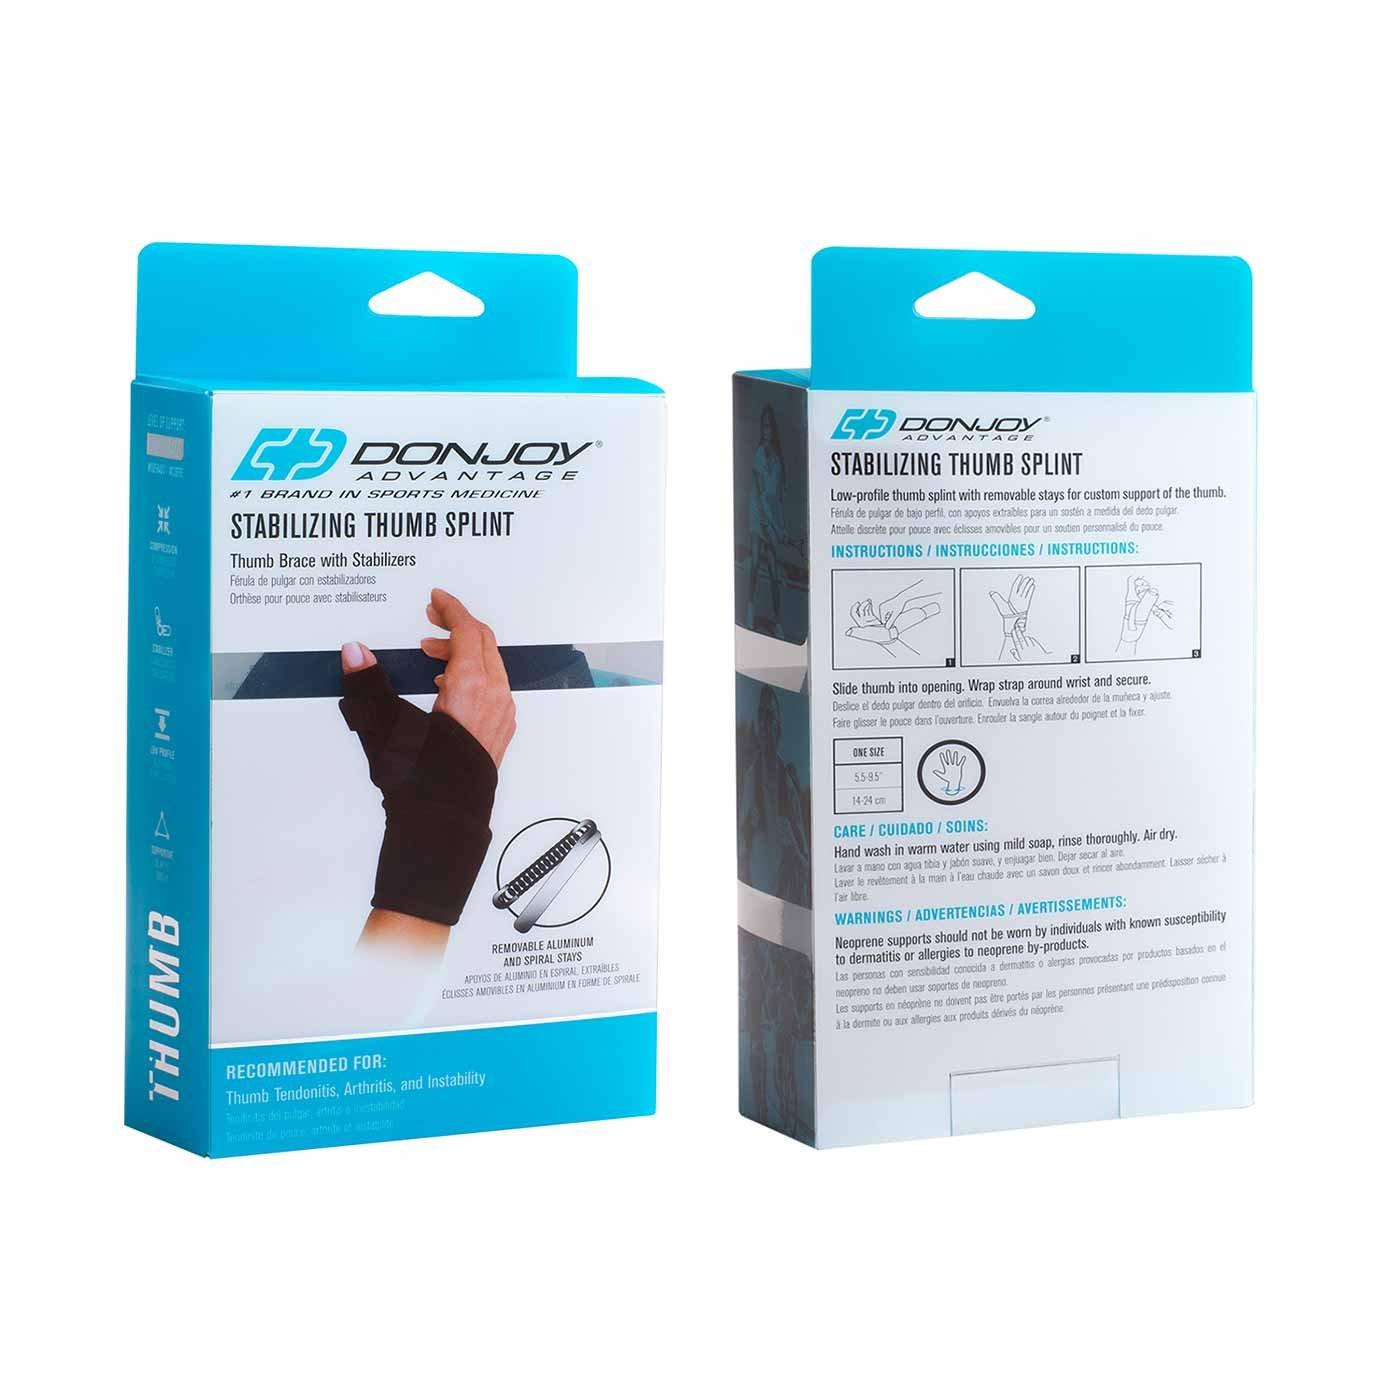 DonJoy Advantage DA161TB01-BLK Wrap Around Stabilizing Thumb Splint, Black, Adjustable, Fits 5.5'' to 9.5'', Best for Tendonitis, Arthritis, Instability by DonJoy Advantage (Image #2)